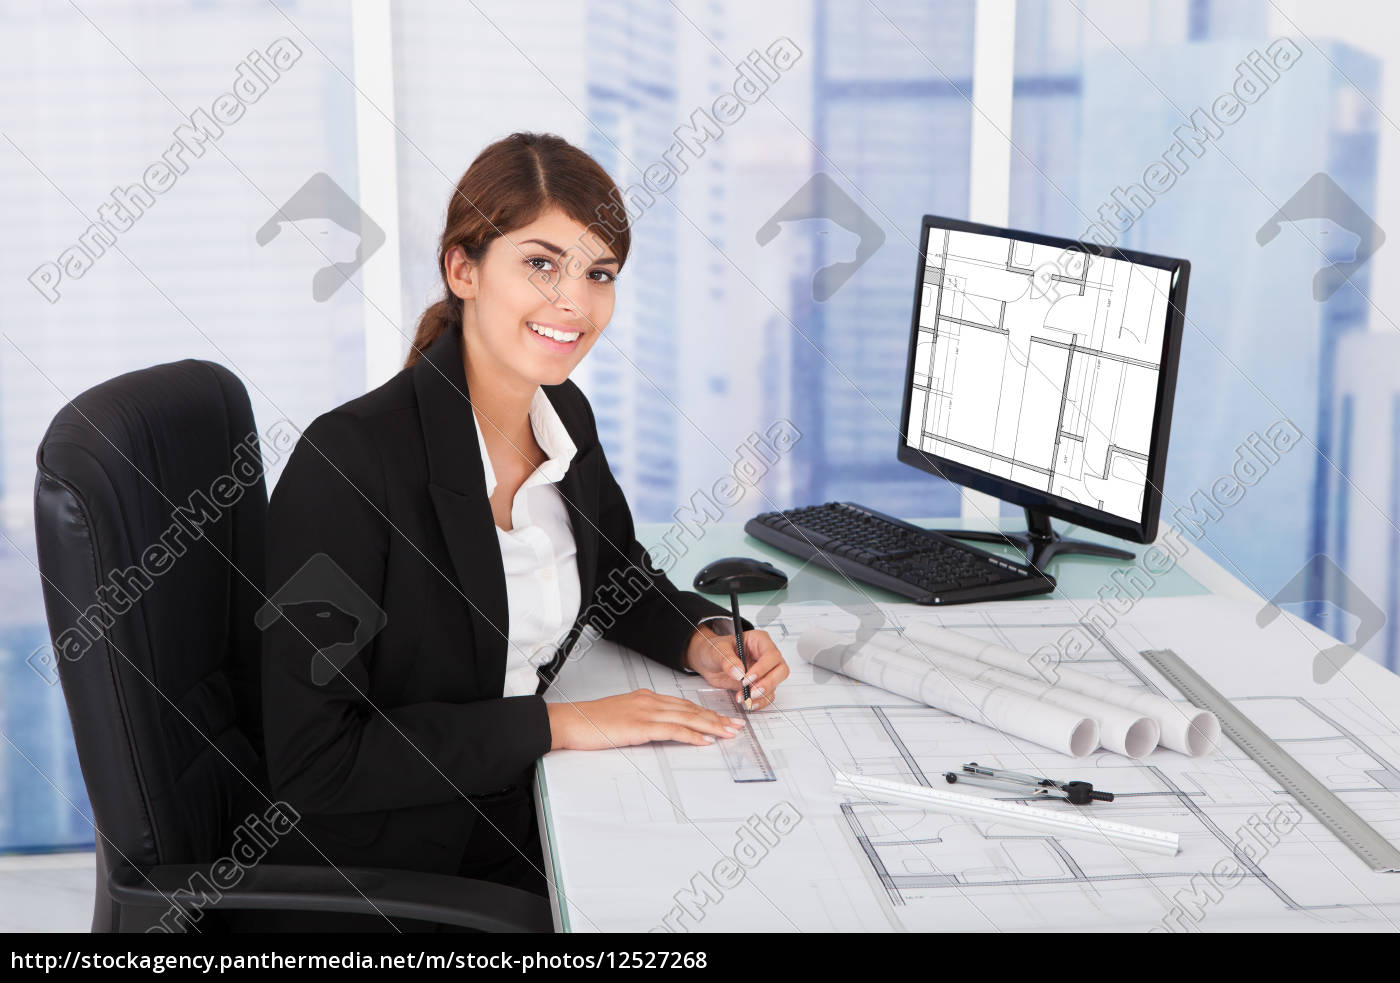 female, architect, working, on, blueprint, at - 12527268